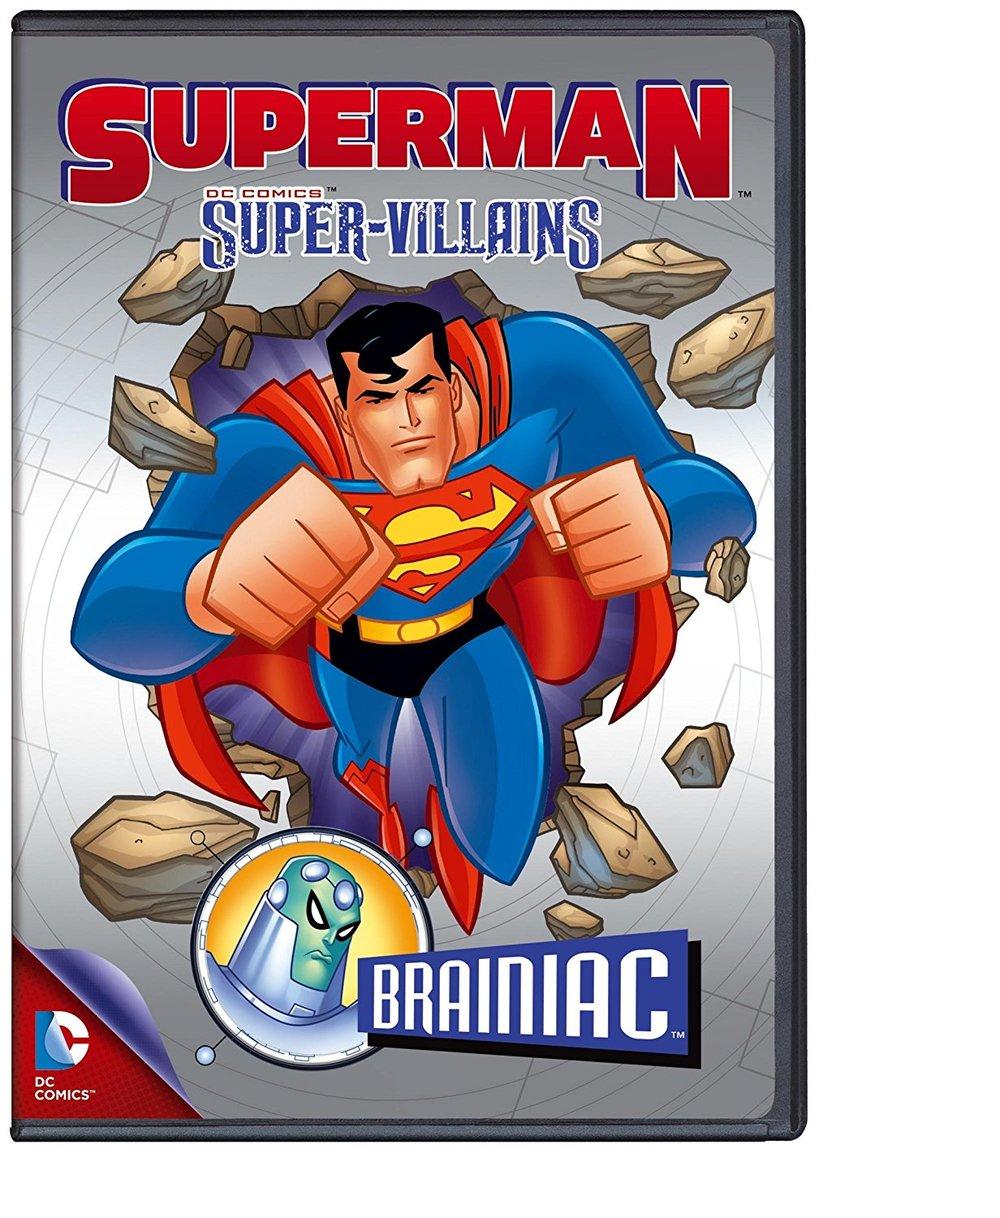 Superman Super-Villains Braniac.jpg